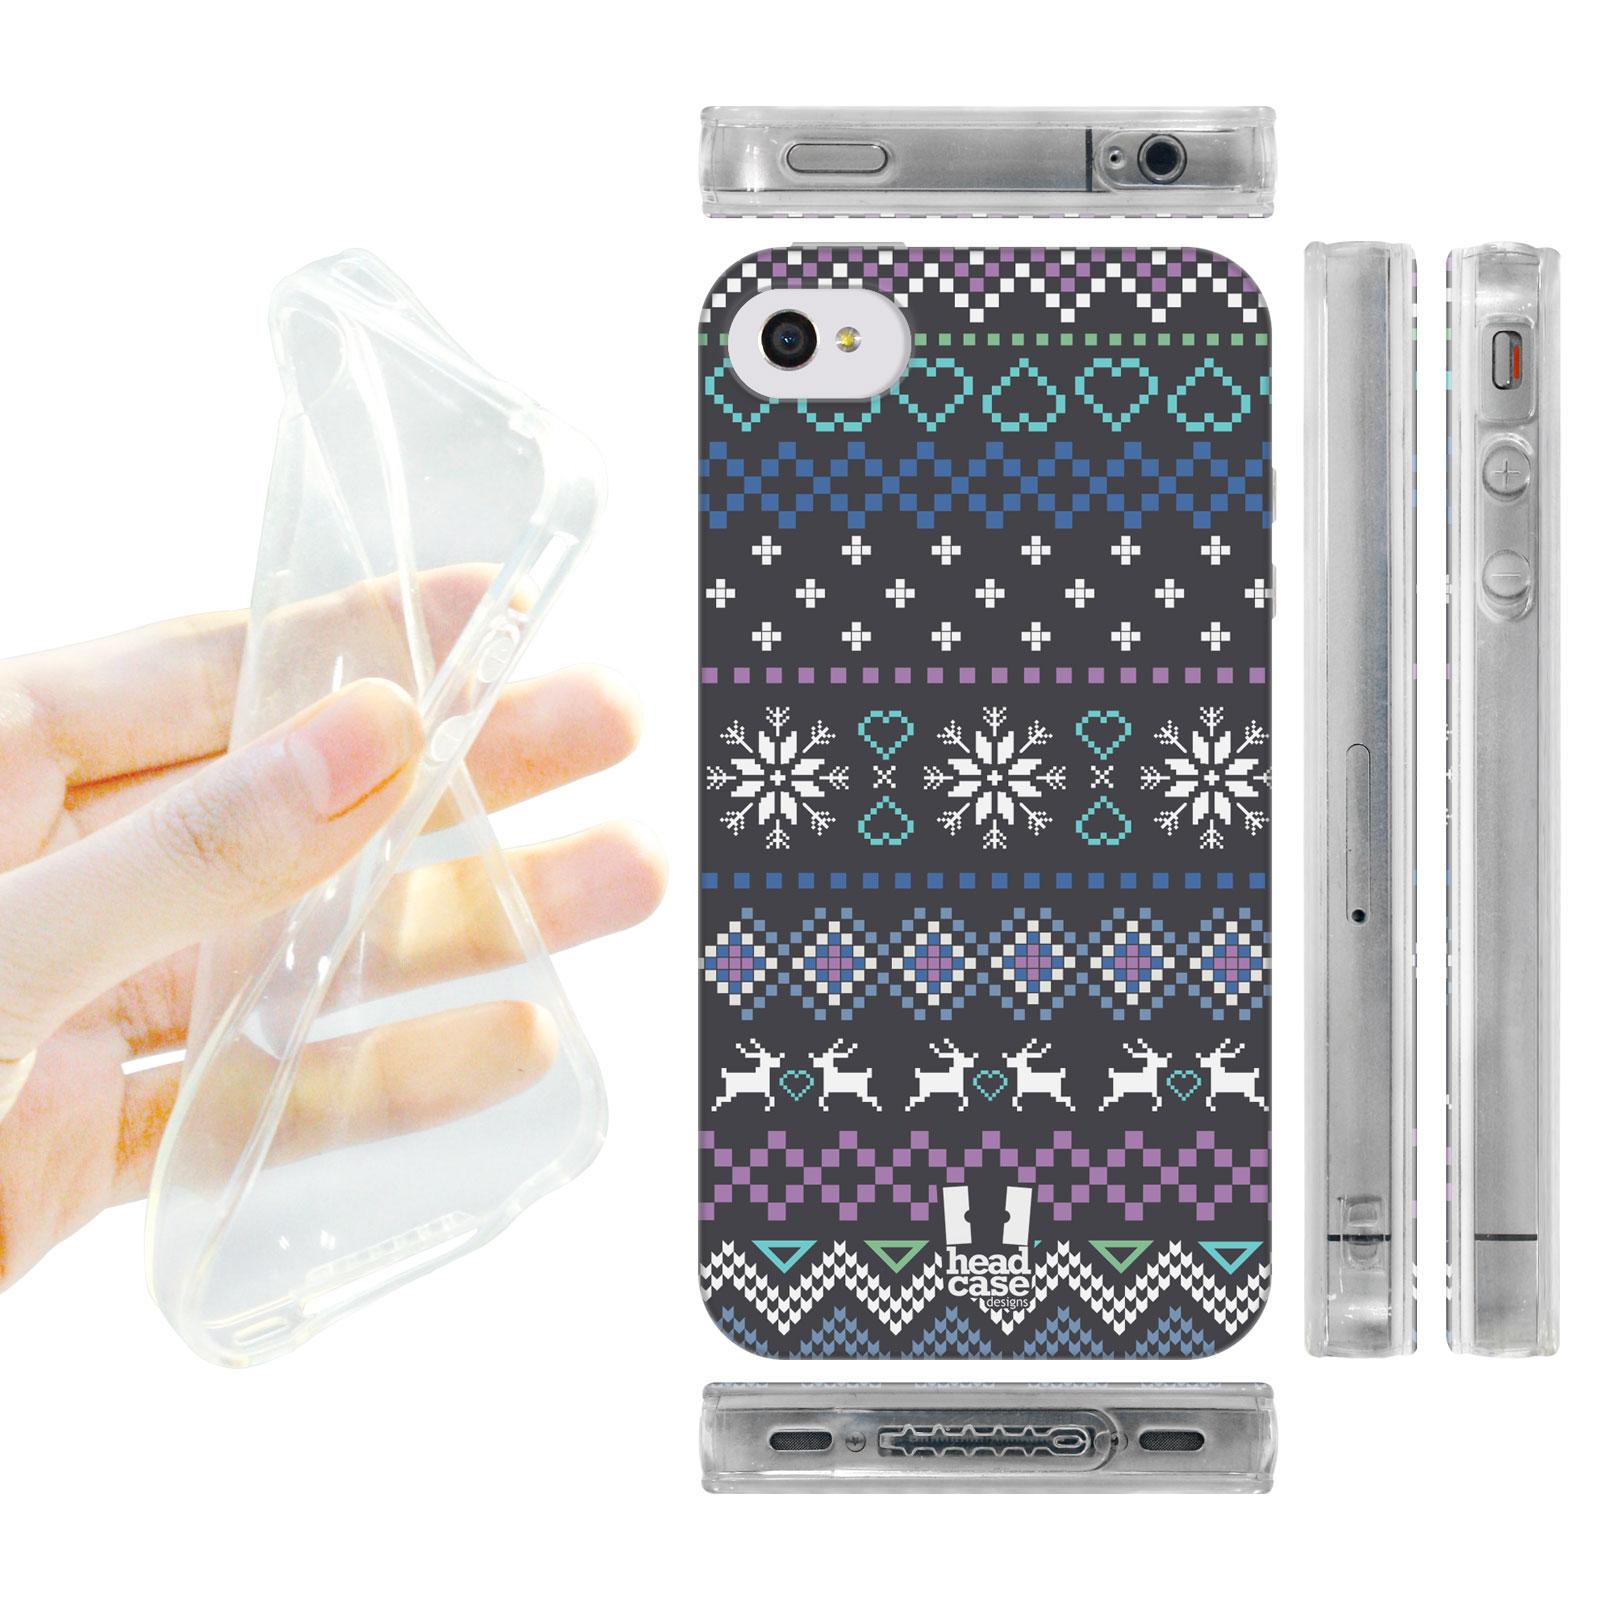 HEAD CASE silikonový obal na mobil Iphone 4/4S Vzor zima barevný značky